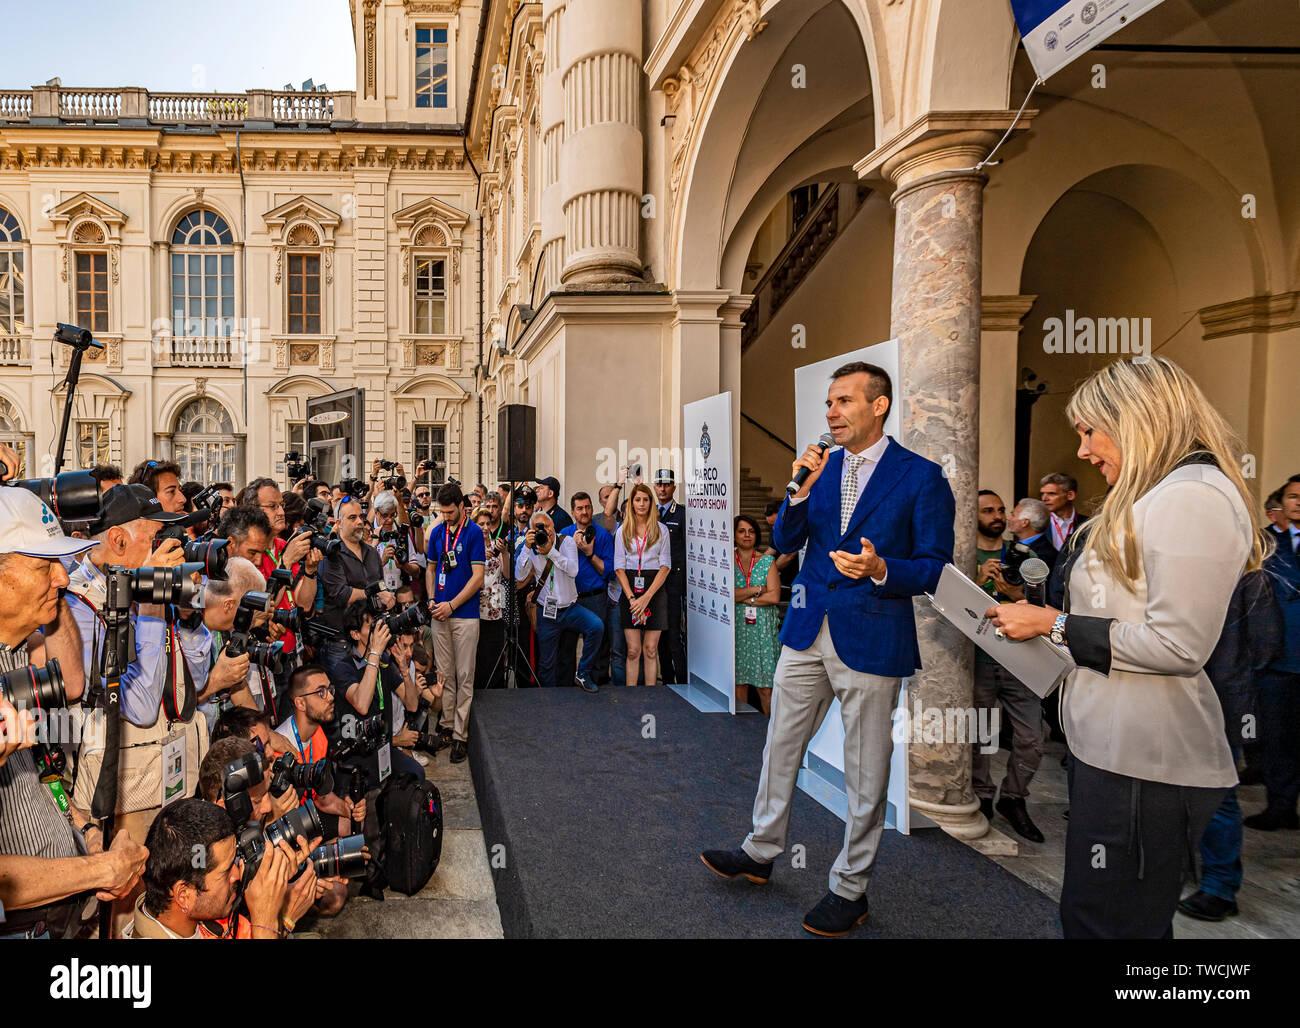 Piedmont Turin - Turin auto show 2019  - Valentino park - Valentino castle - Andrea Levy - President of the event Stock Photo